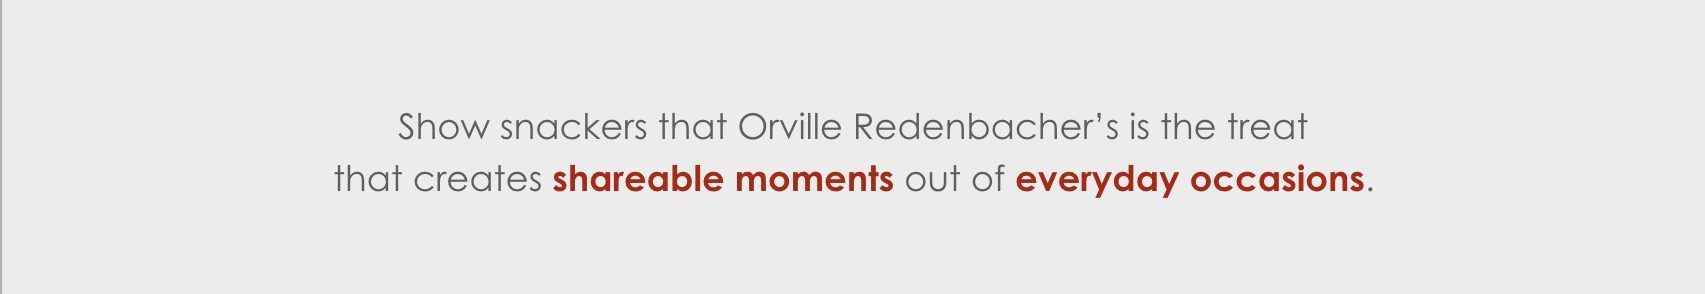 Orville Redenbacher's brand strategy